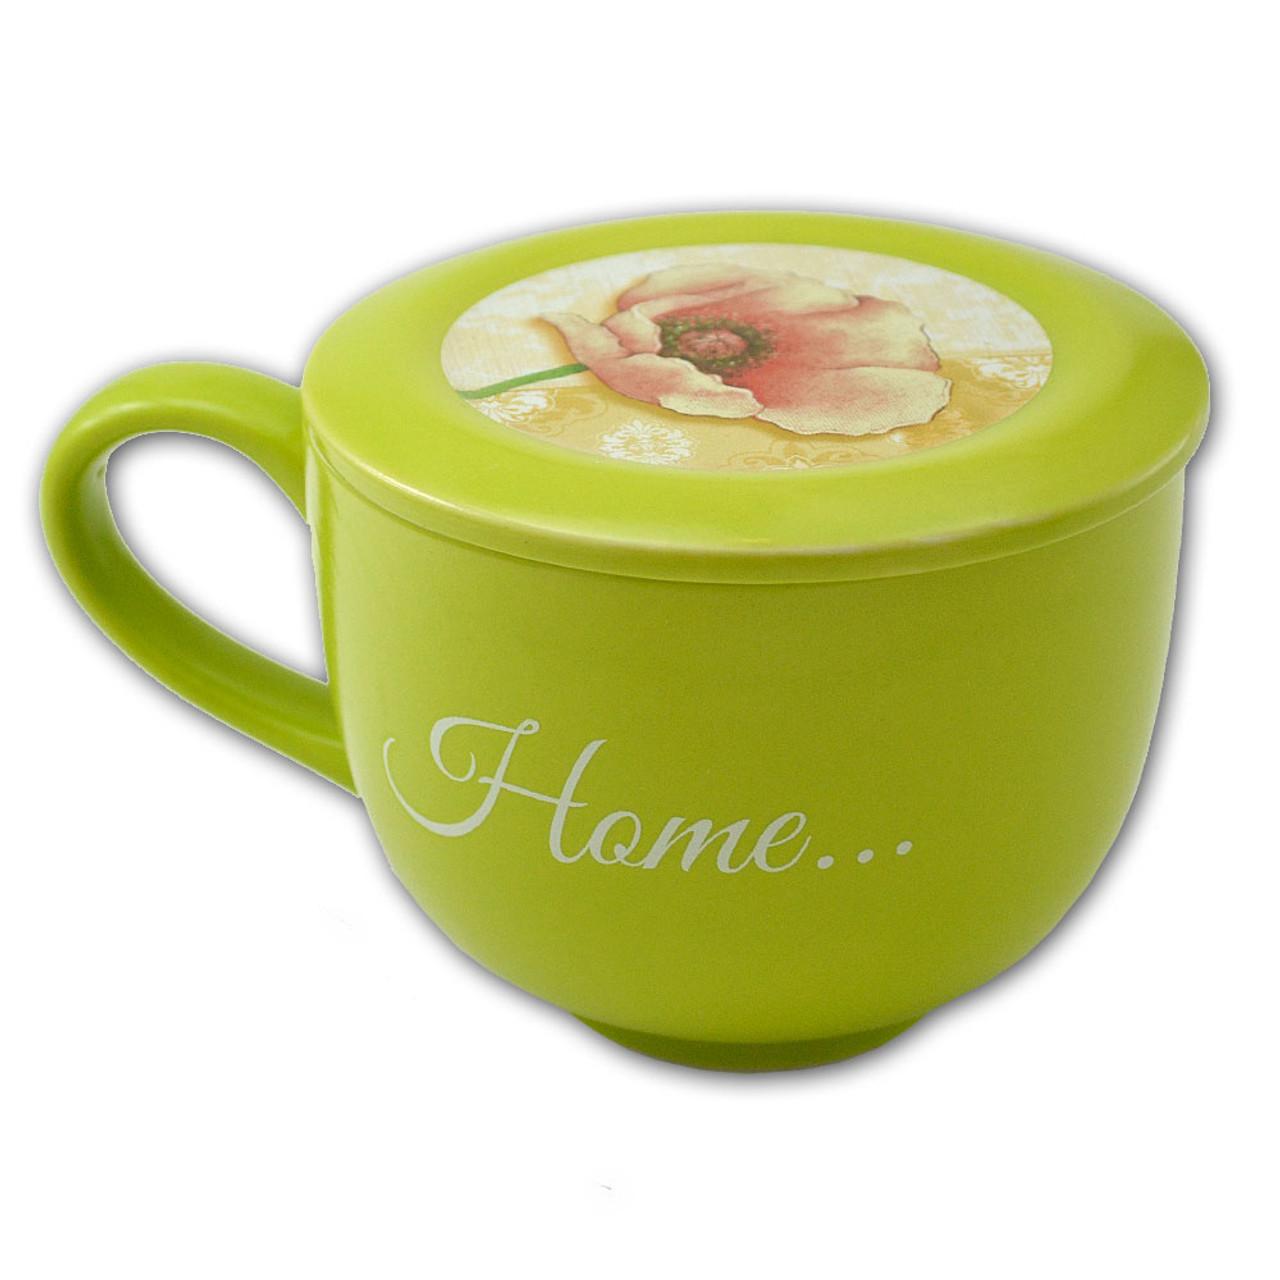 Home Soup Mug with Coaster Lid